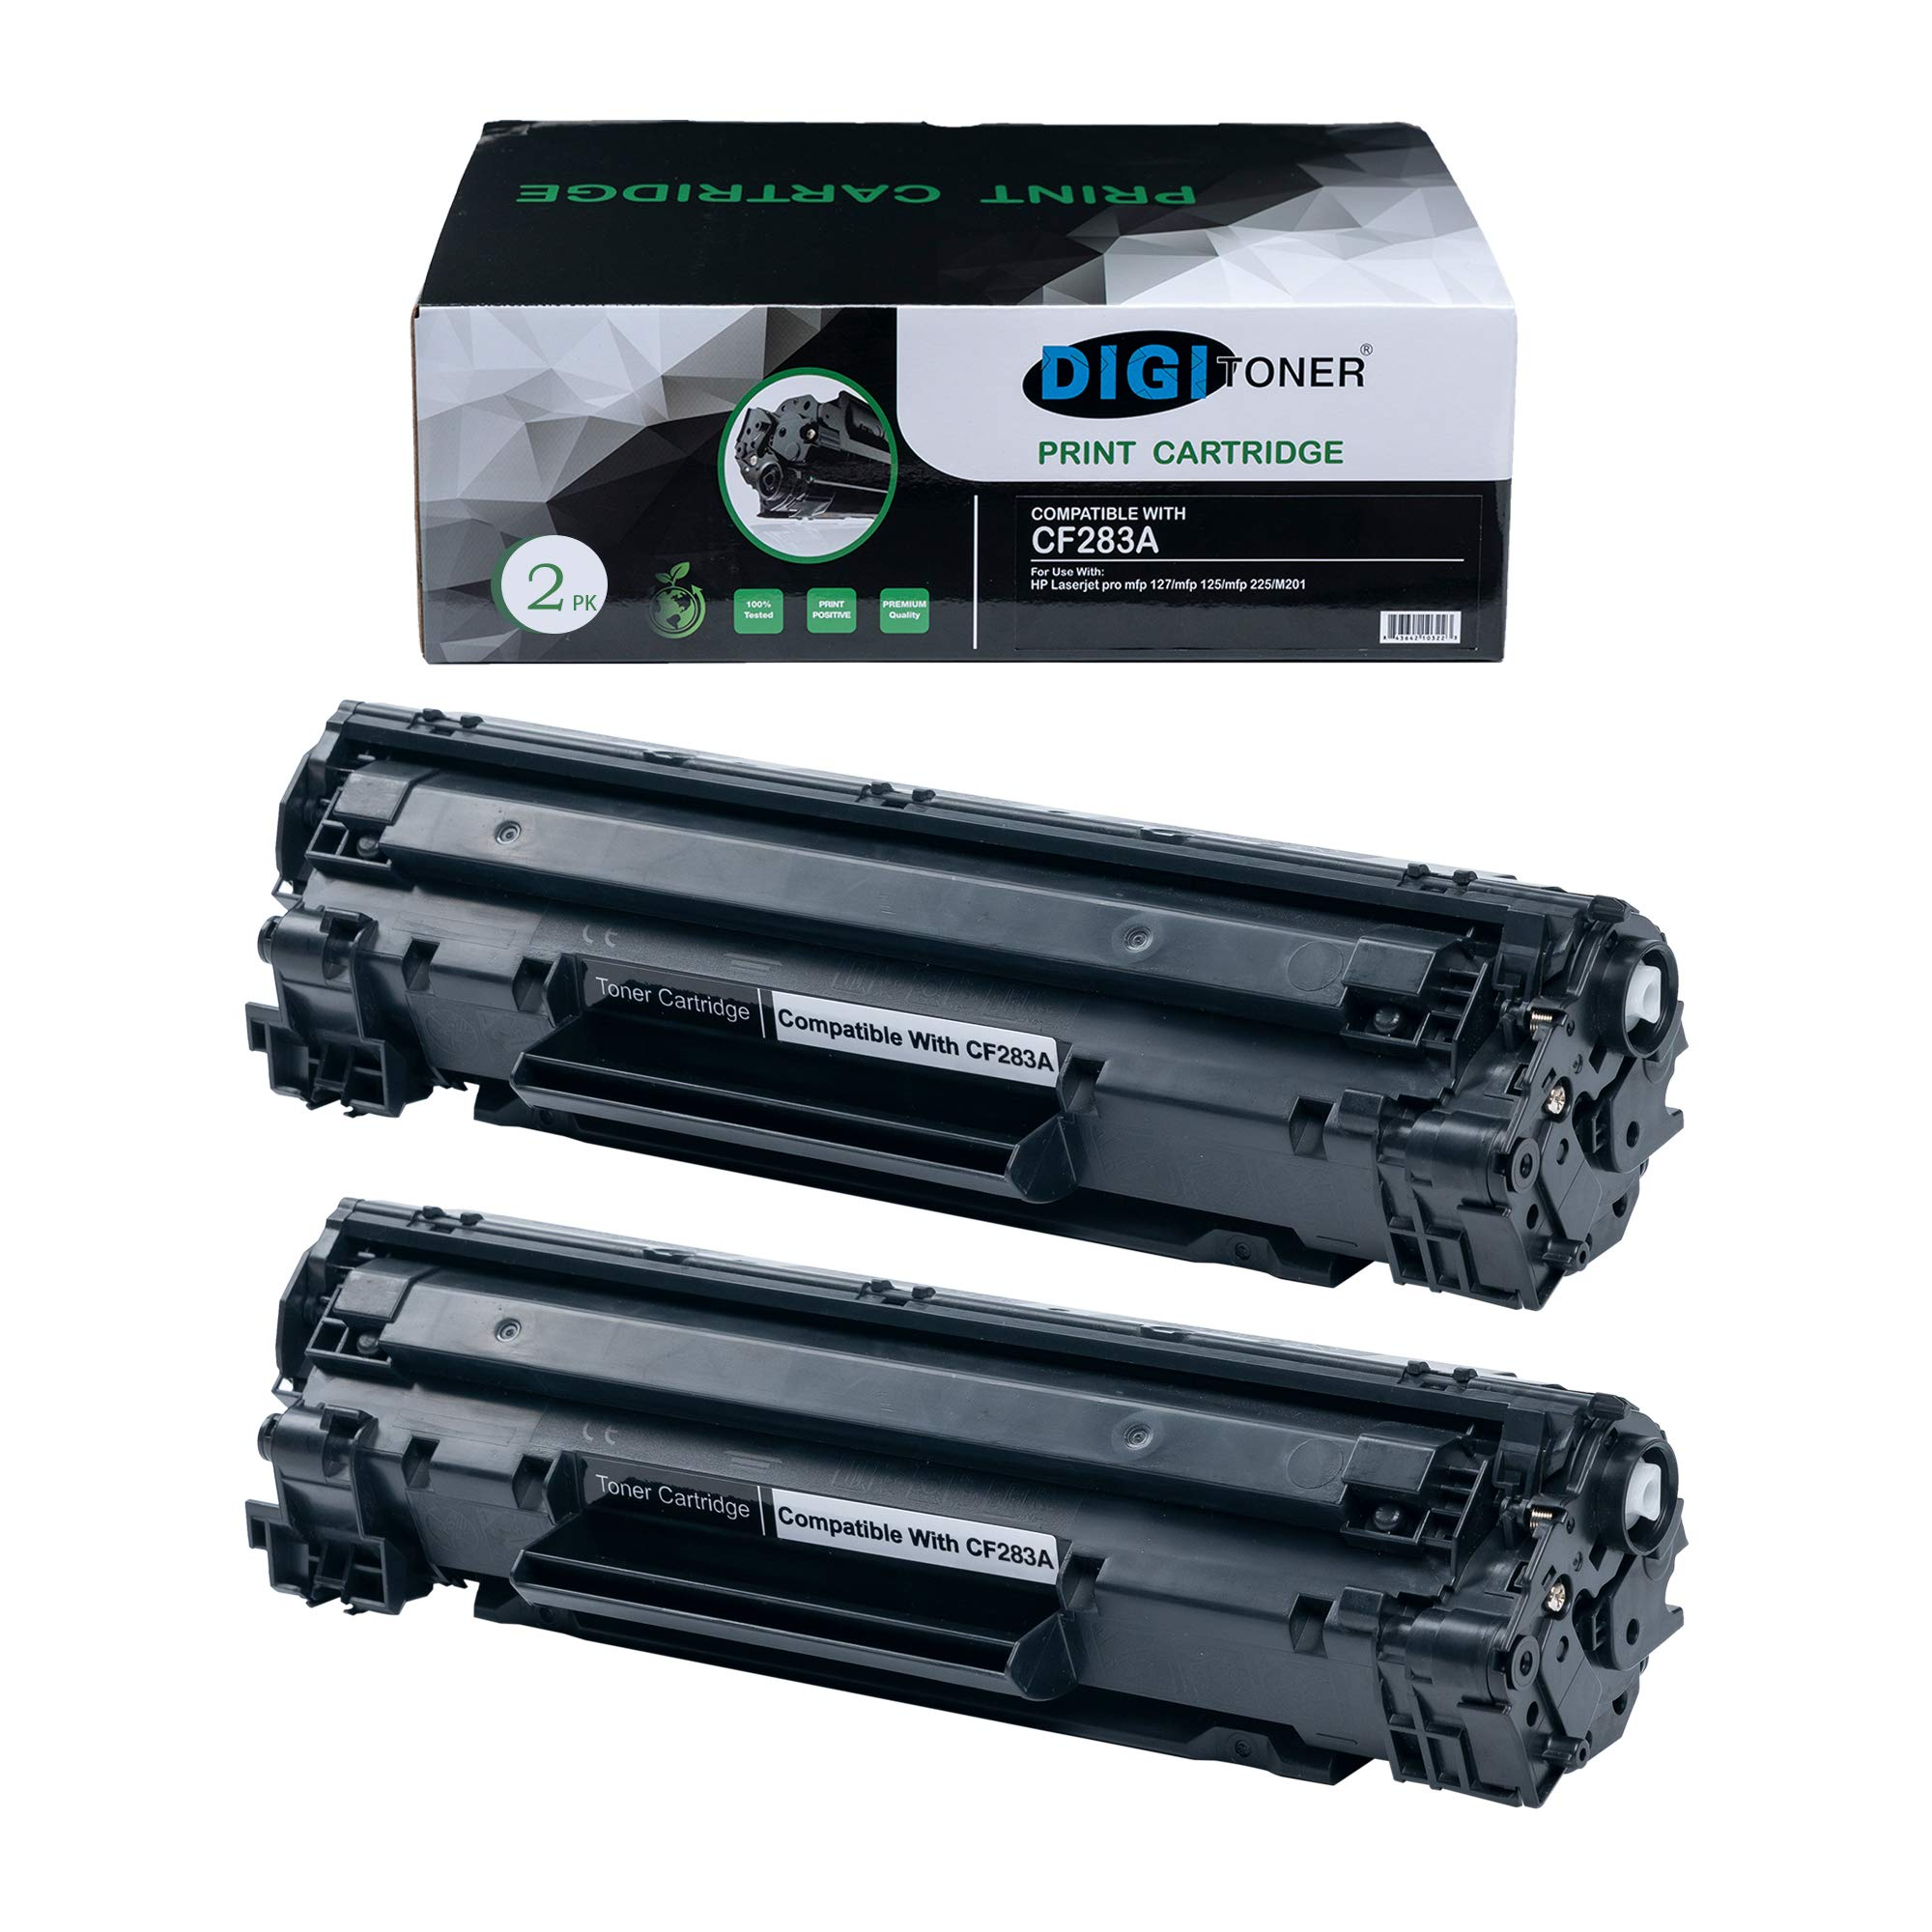 DIGITONER Compatible HP CF283A Toner Cartridge – CF283A High Yield Toner Cartridge Replacement for HP Laser Printer – Black [2 Pack]